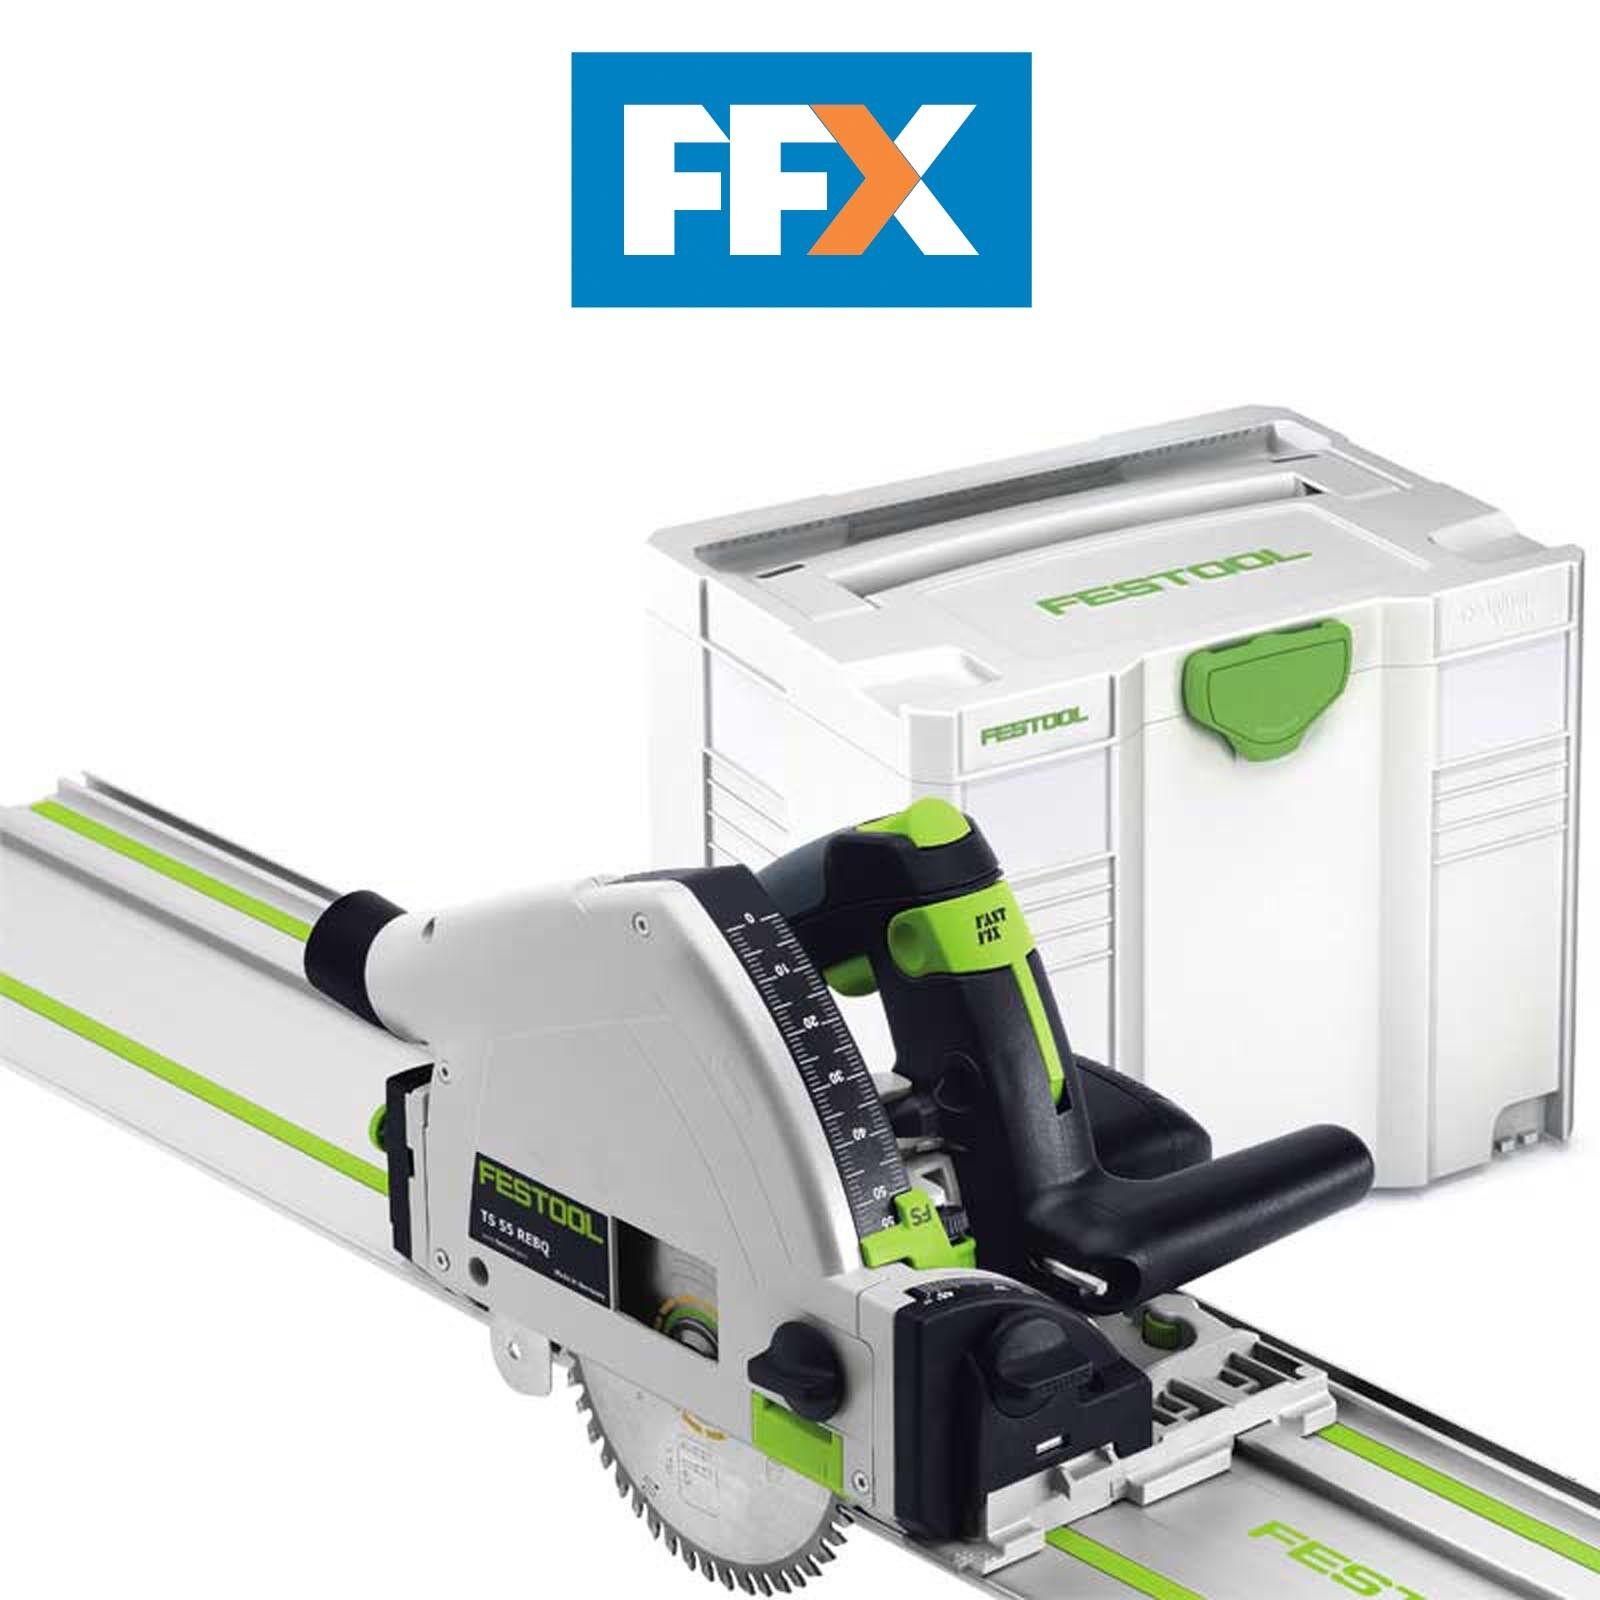 Festool 561583 TS55 REBQ-Plus-F 240v Plunge Saw, FS1400 Guide Rail + Systainer 4